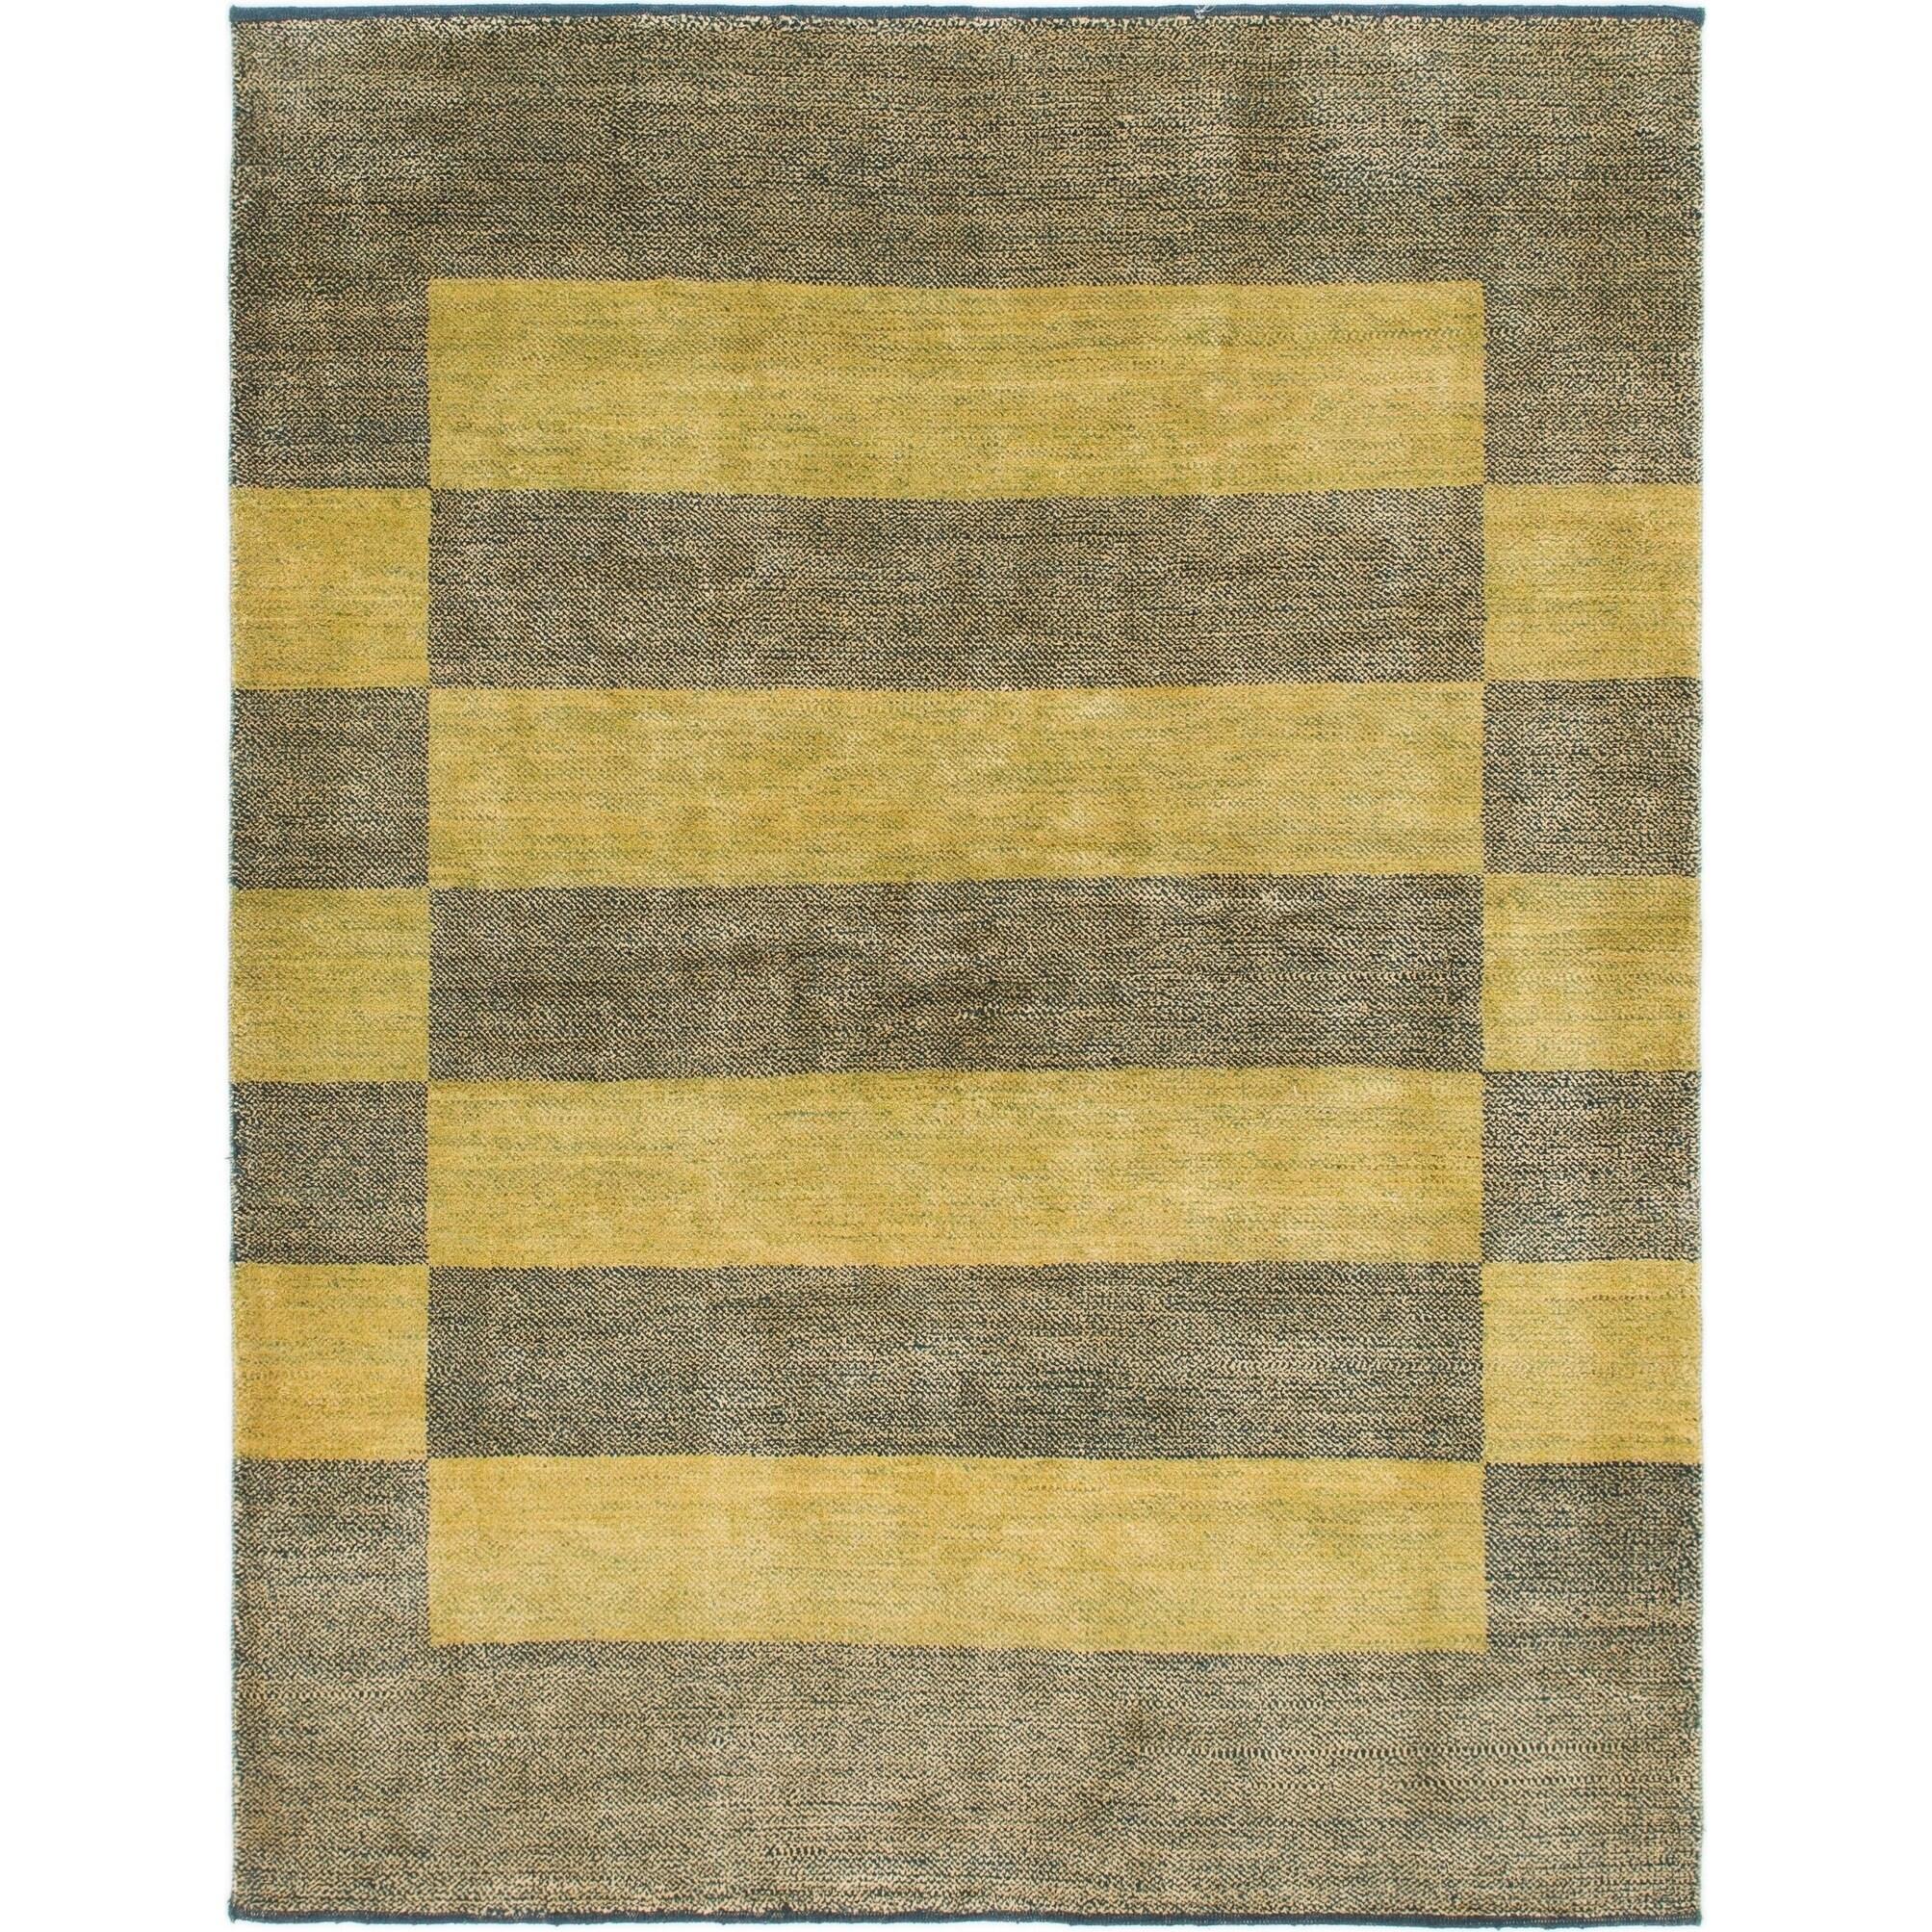 Hand Knotted Kashkuli Gabbeh Wool Area Rug - 6 x 7 10 (Green - 6 x 7 10)